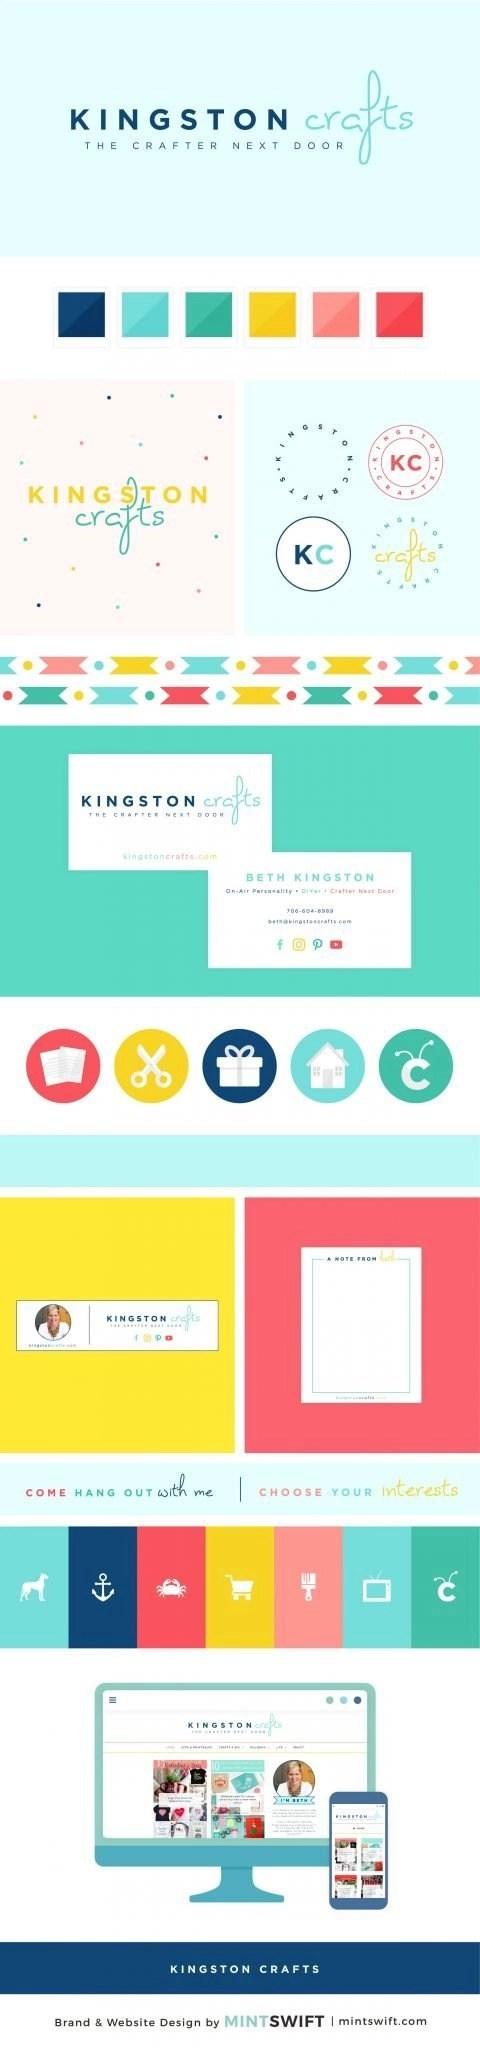 Kingston Crafts - Brand Design Package - MintSwift